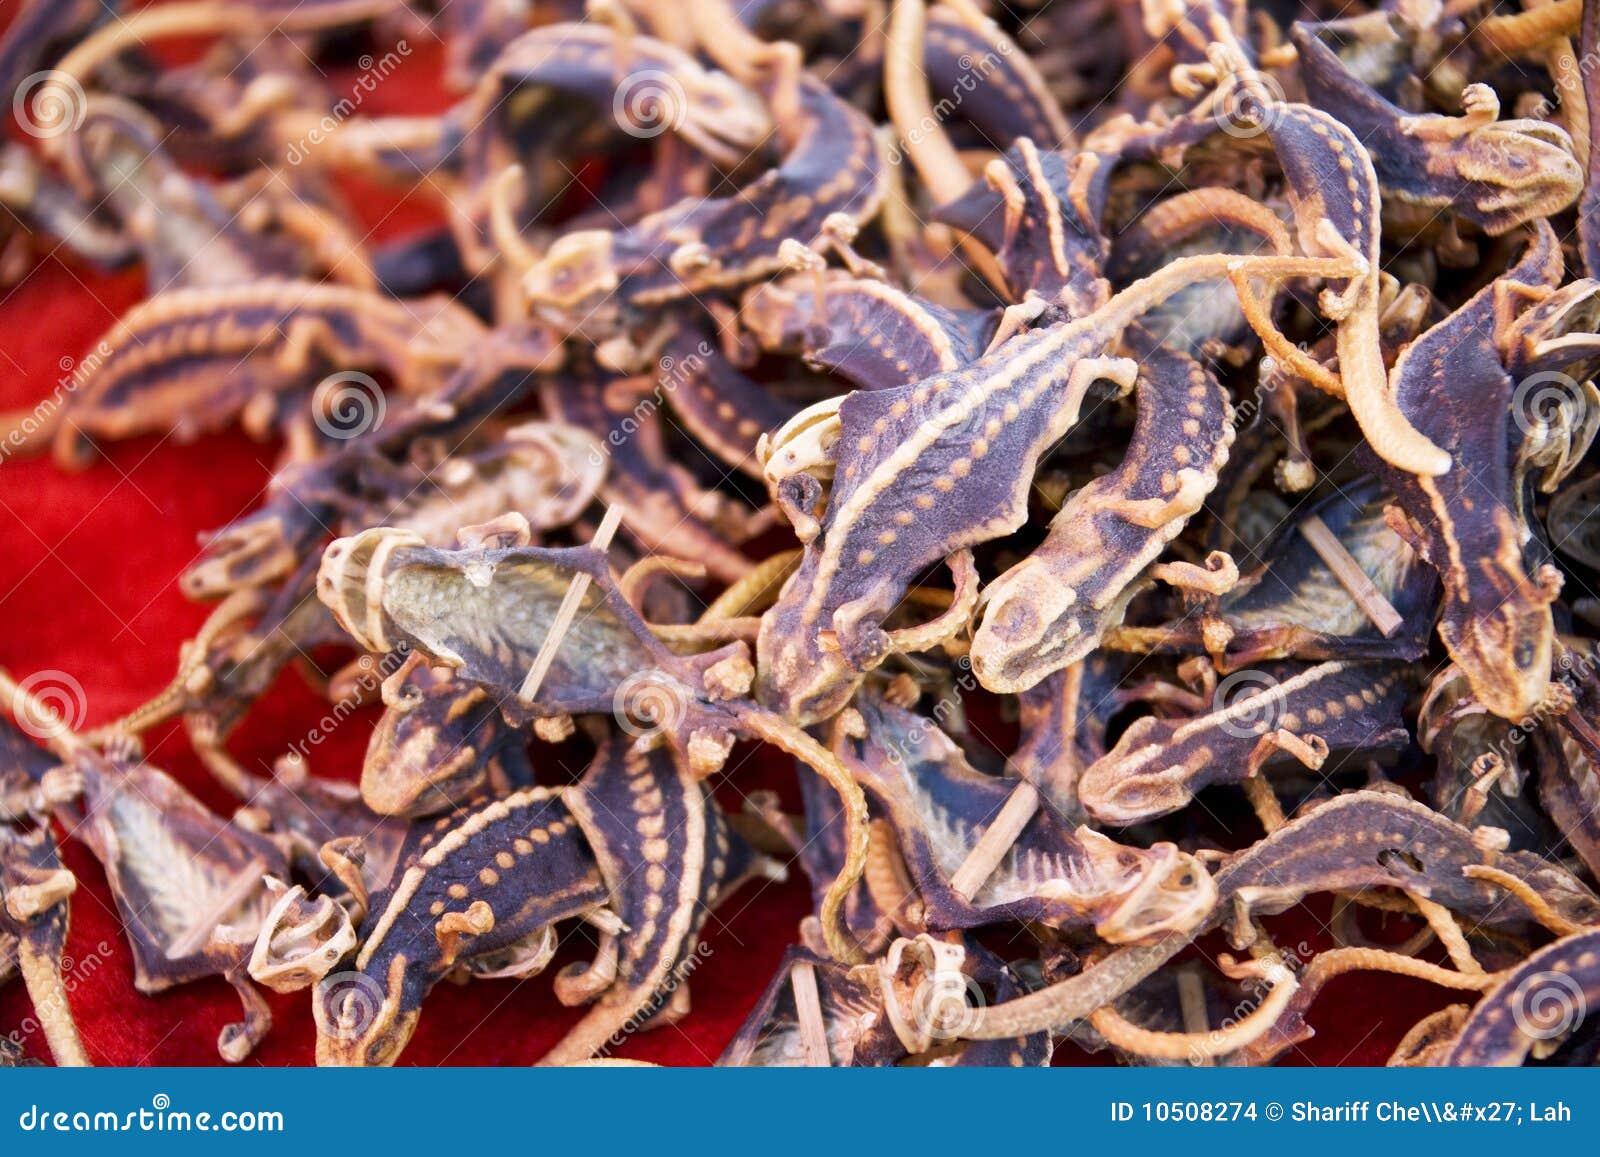 Dried Medicinal Lizards